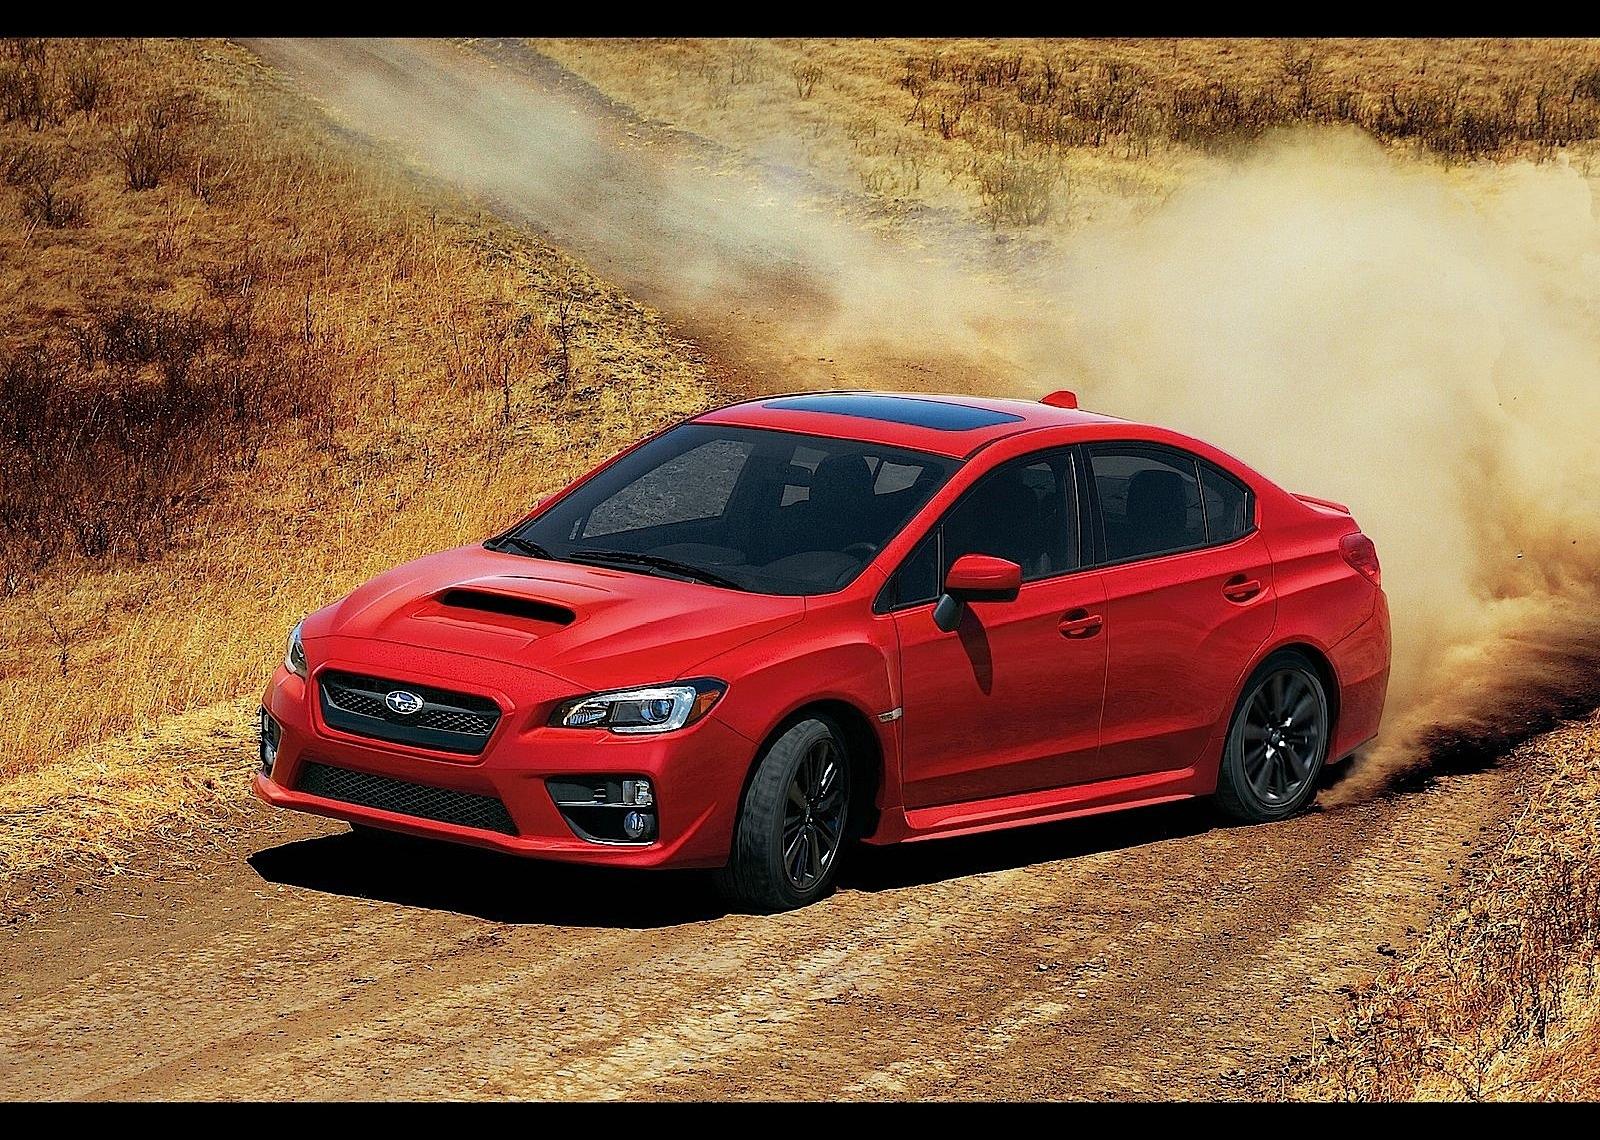 Subaru 2015 subaru forester specs : SUBARU WRX specs - 2014, 2015, 2016, 2017, 2018 - autoevolution